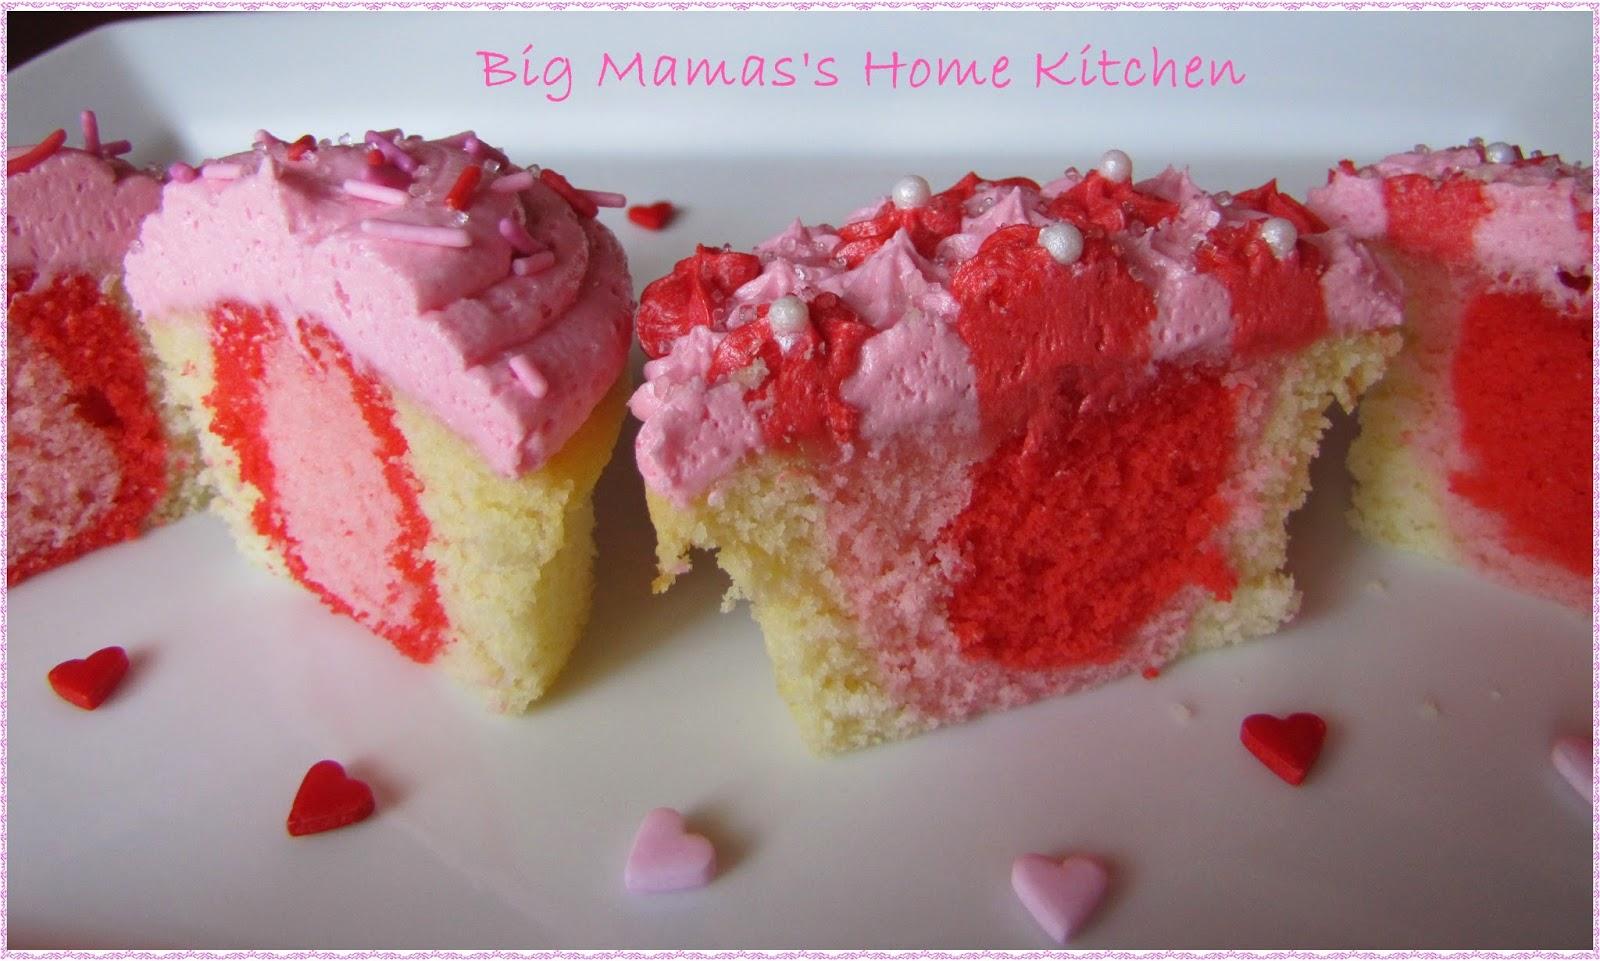 Big Mama's Home Kitchen: Valentine Sweetheart Cupcakes